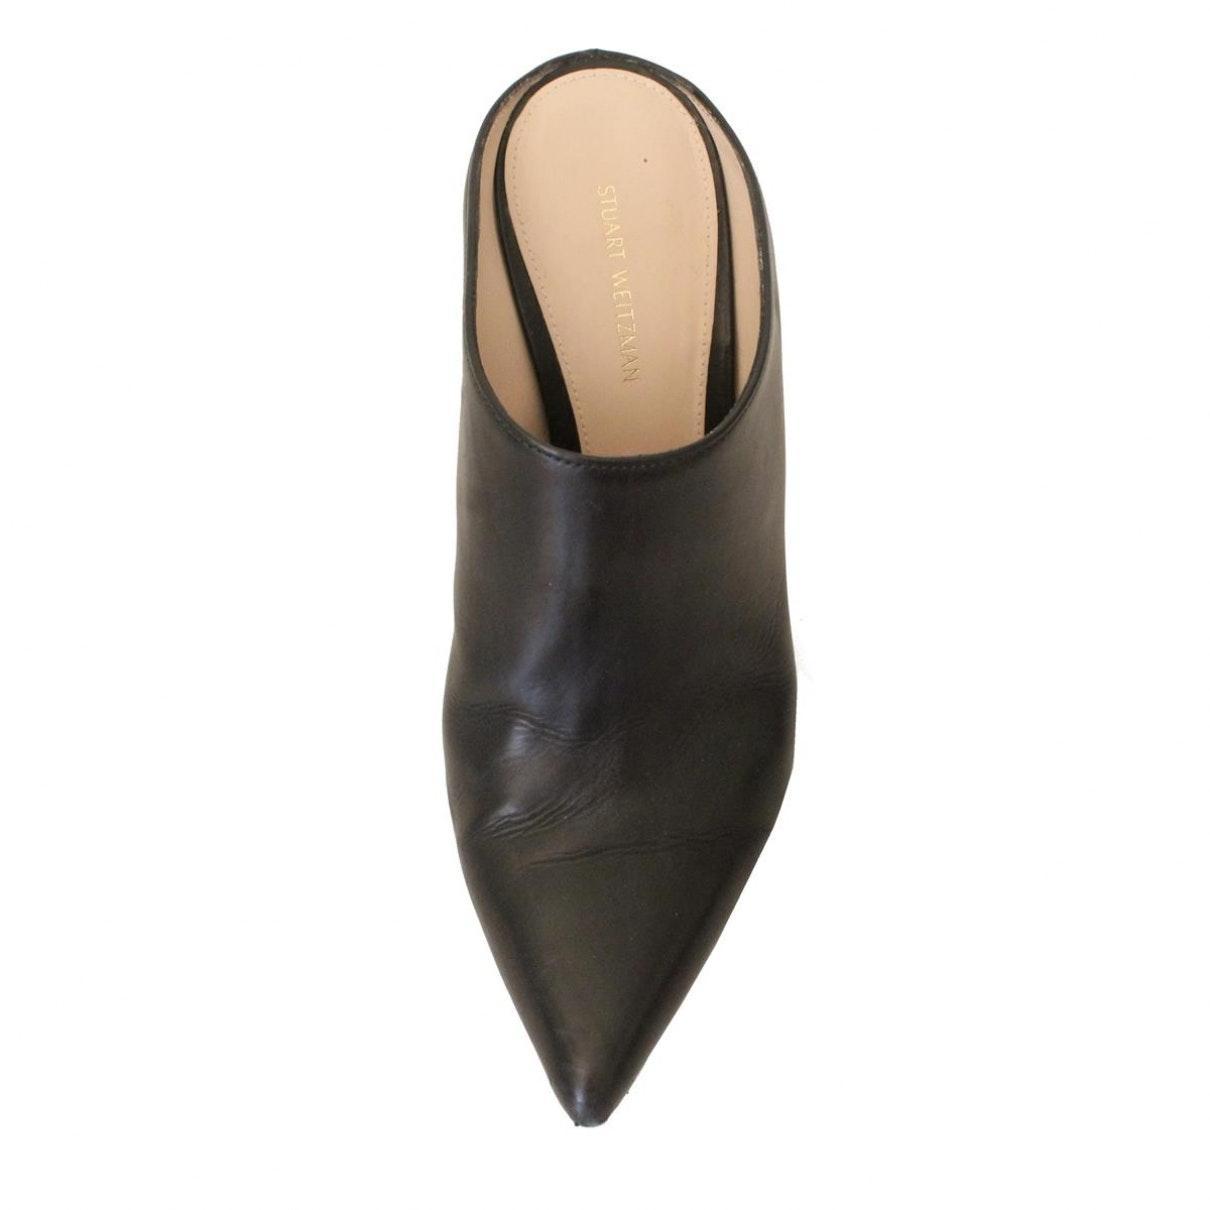 Sandalias en cuero negro N Stuart Weitzman de color Negro